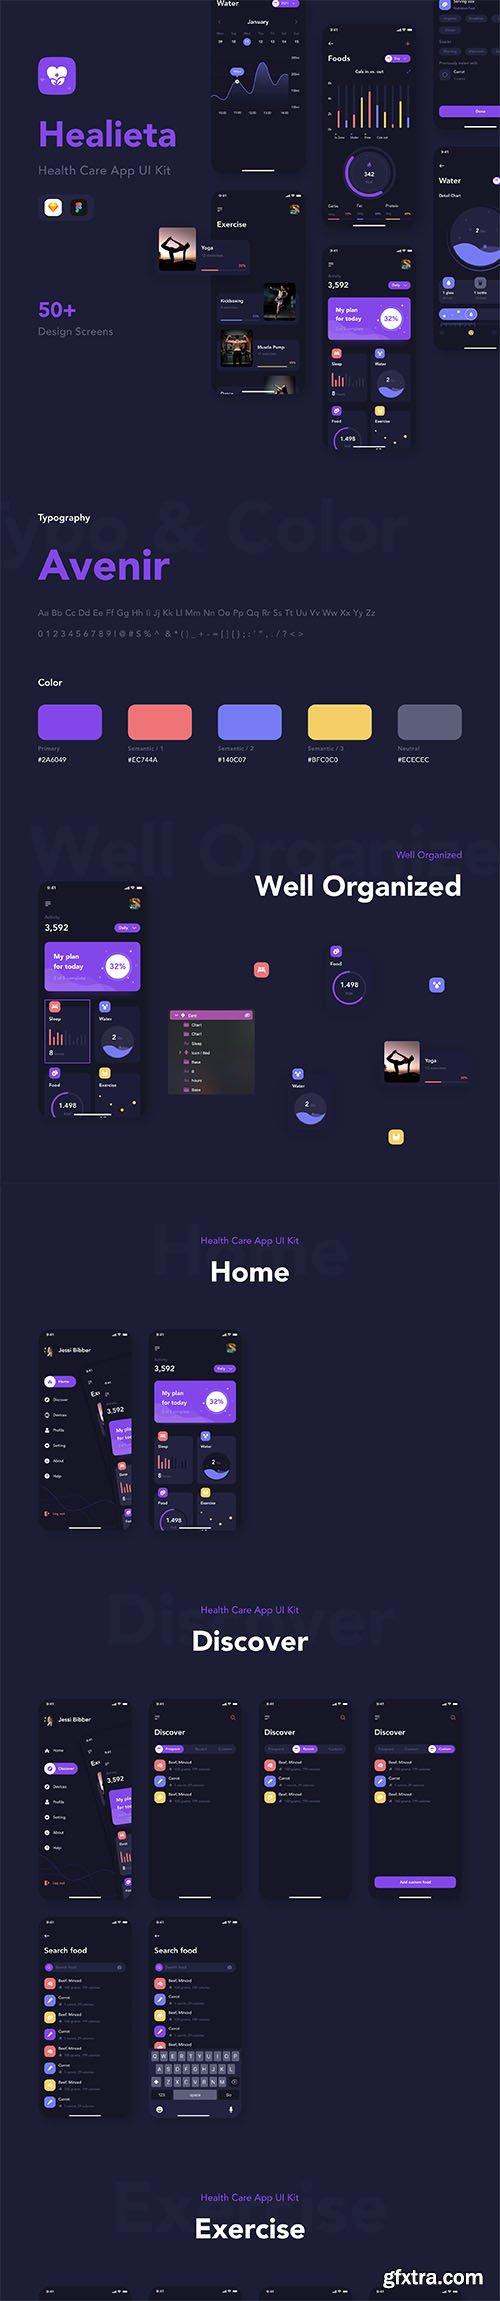 Healieta - Health Care Mobile App UI Kit